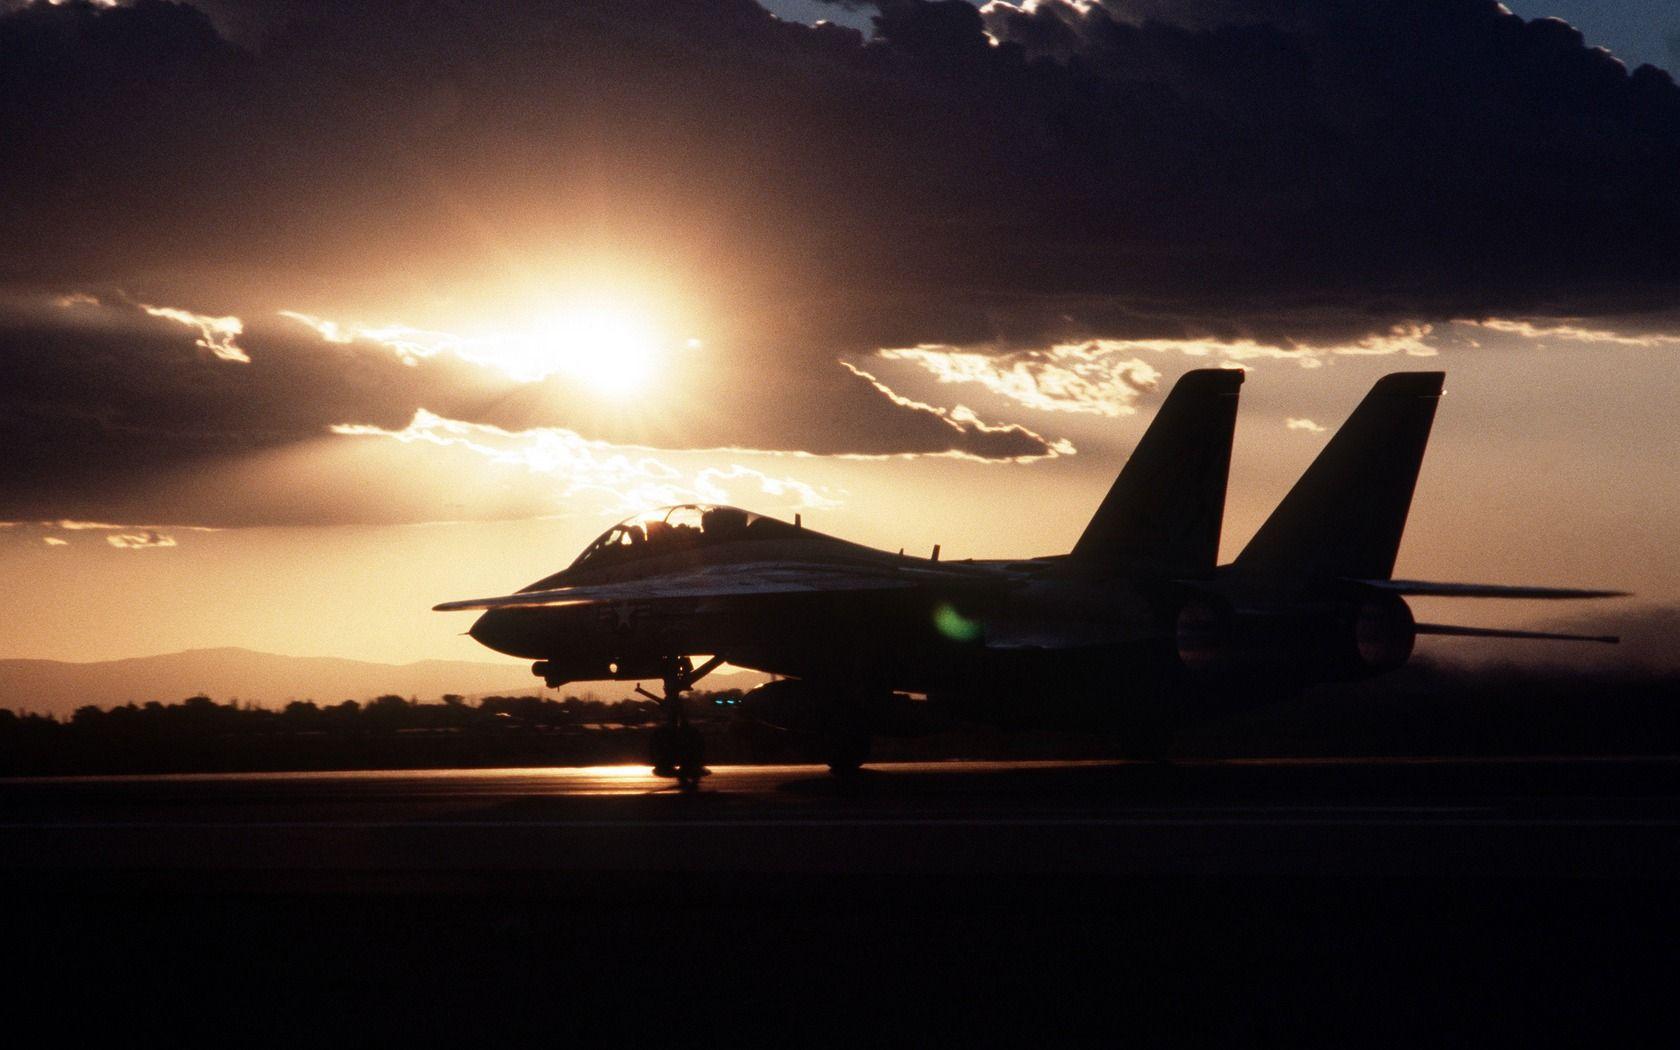 Sunset Landing Fighter Jets Aircraft F14 Tomcat